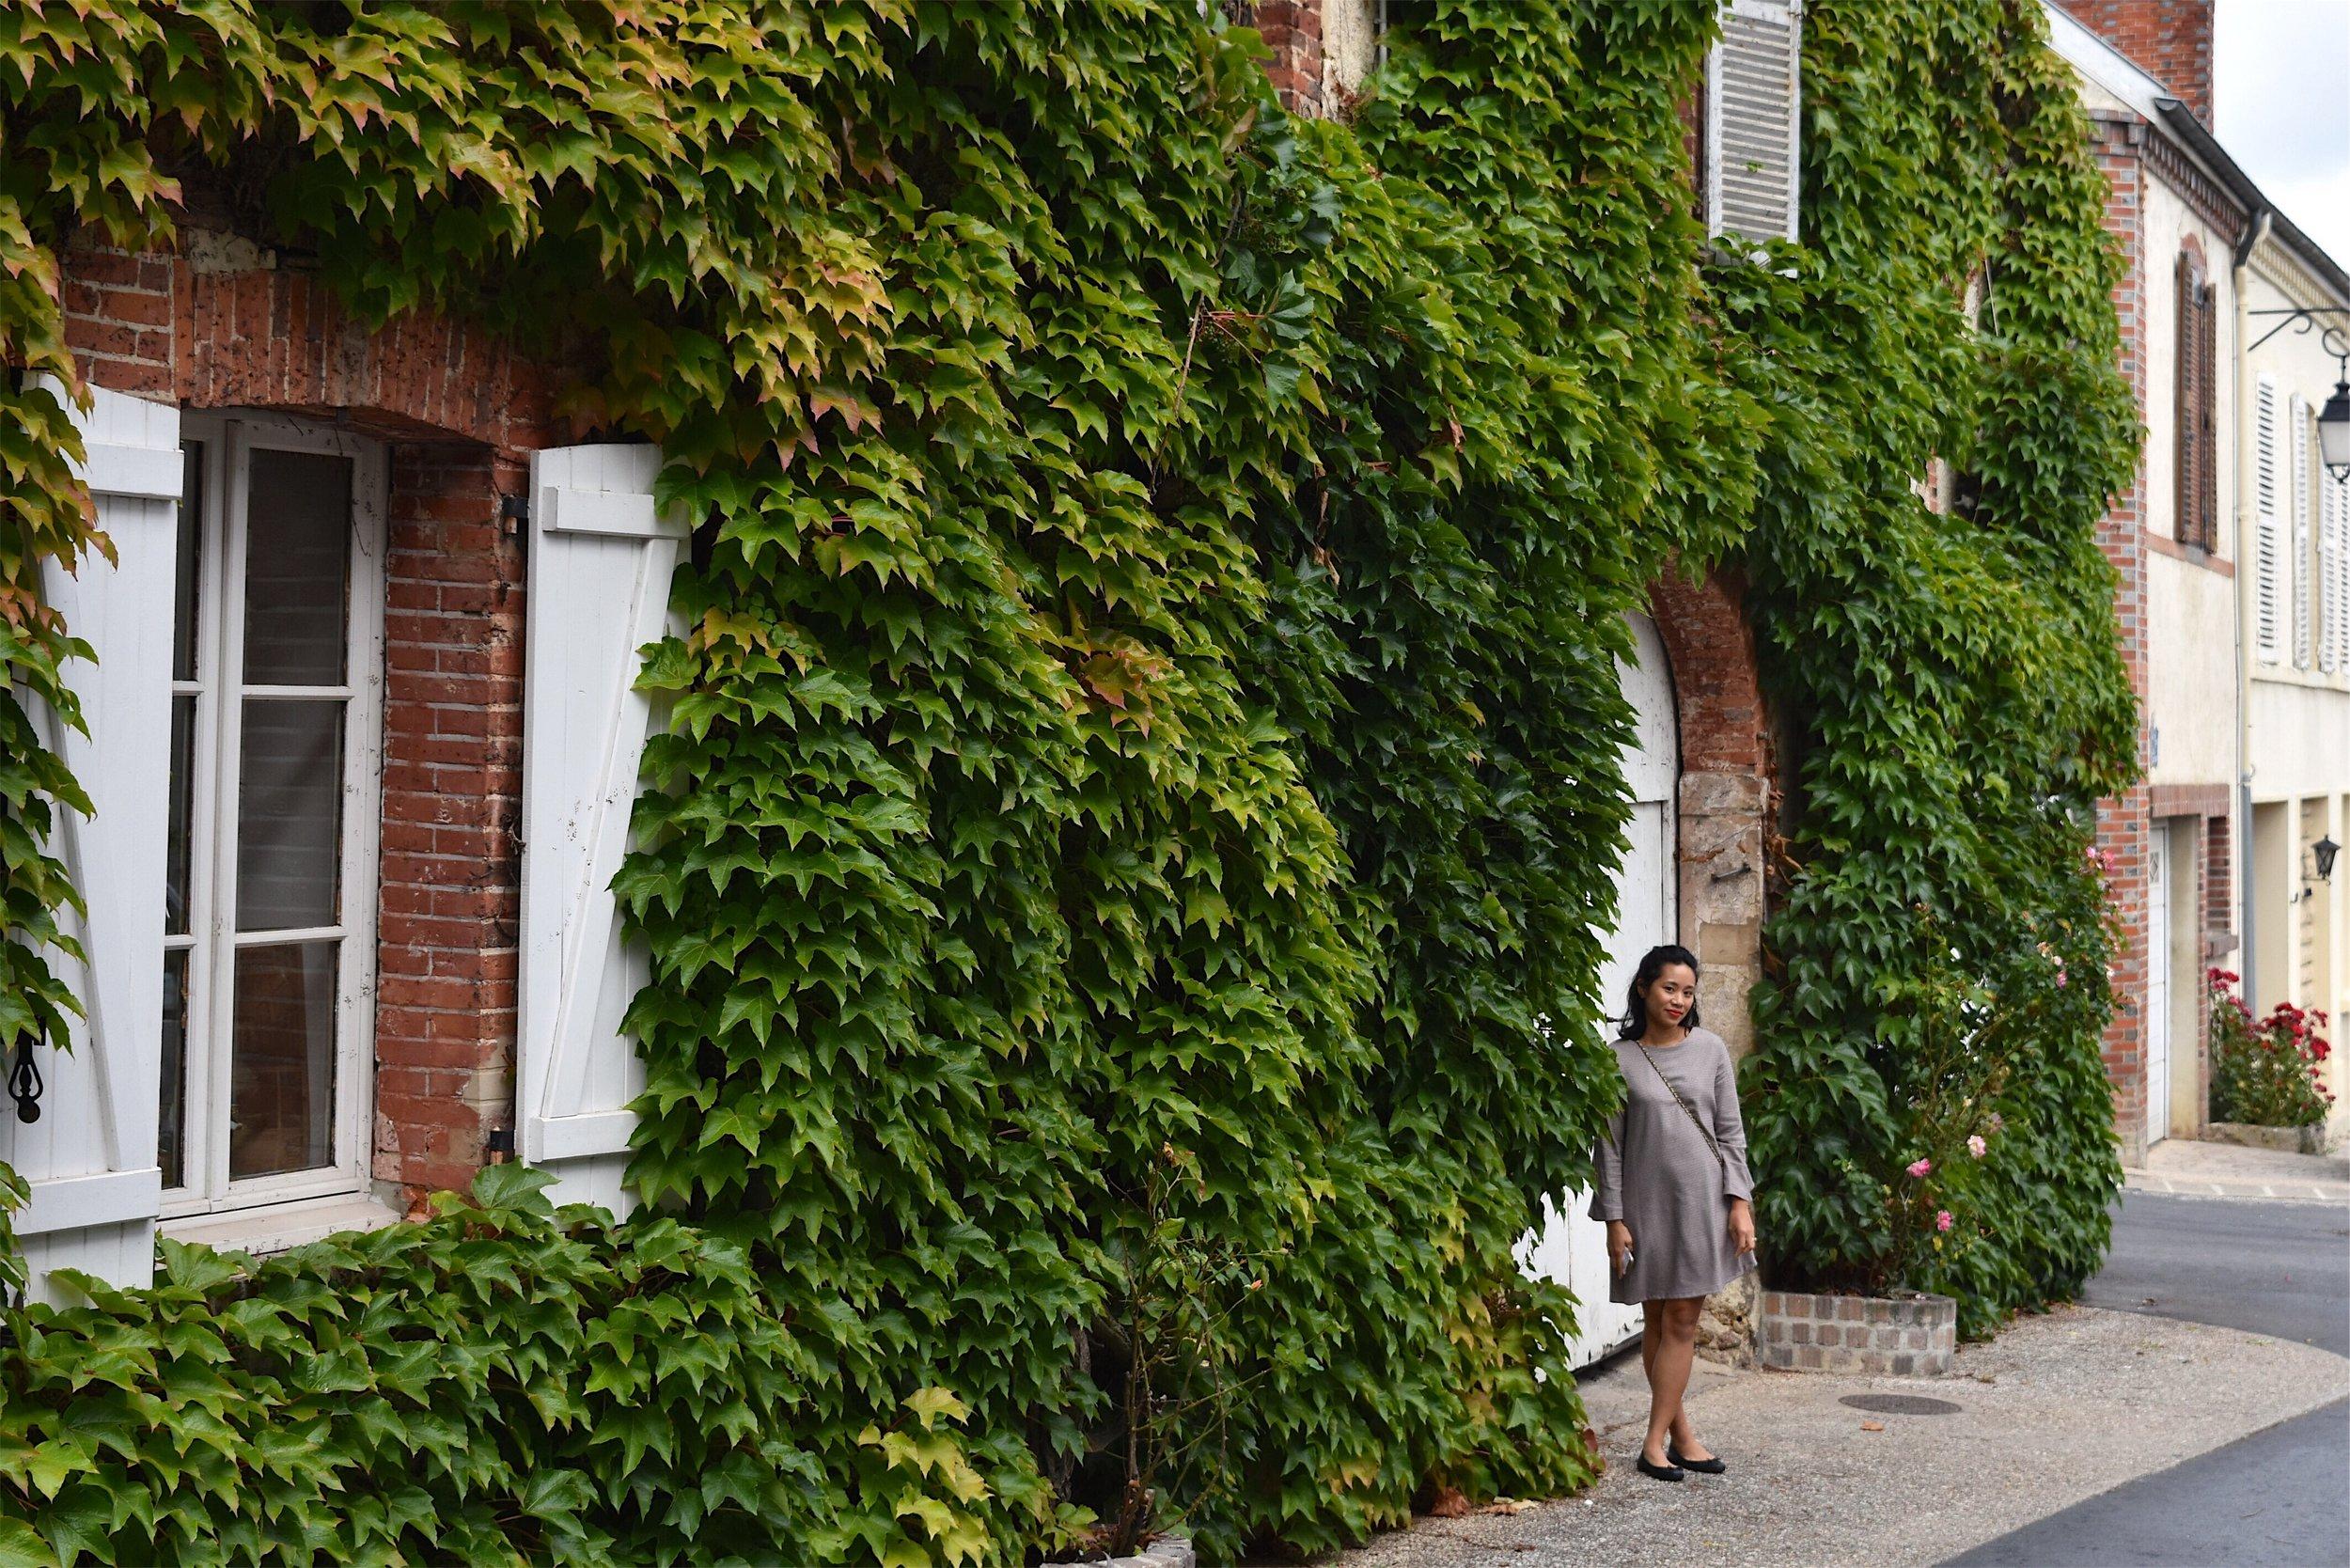 Ivy walls of Hautvillers